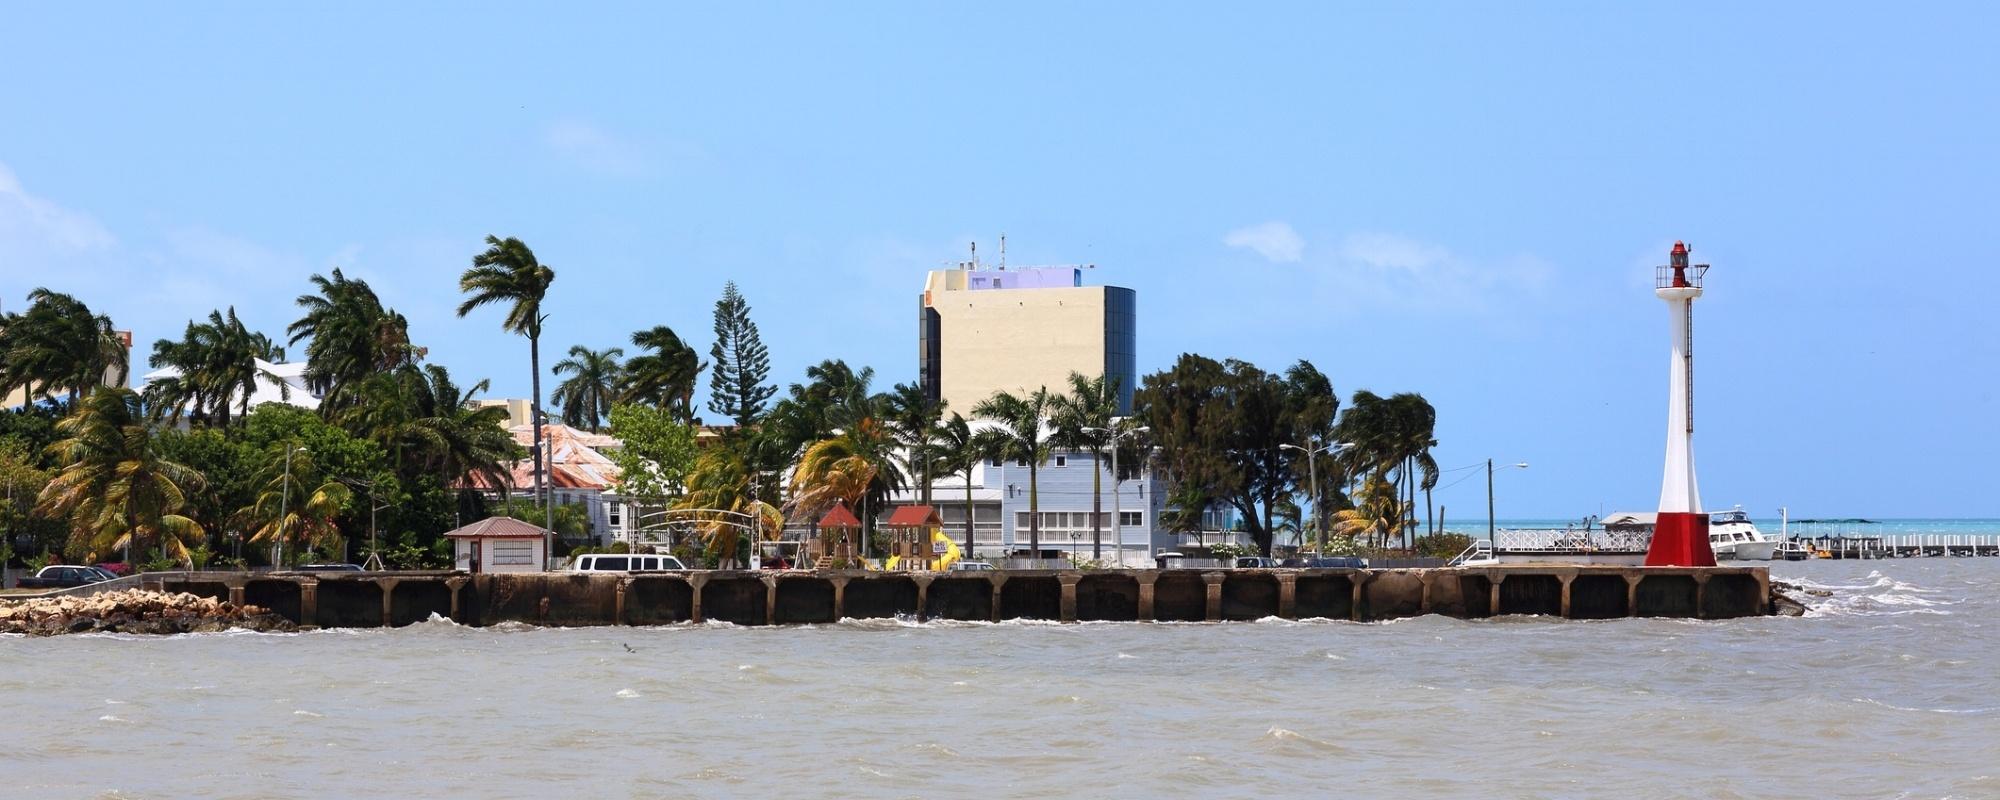 Belize Infrastructure